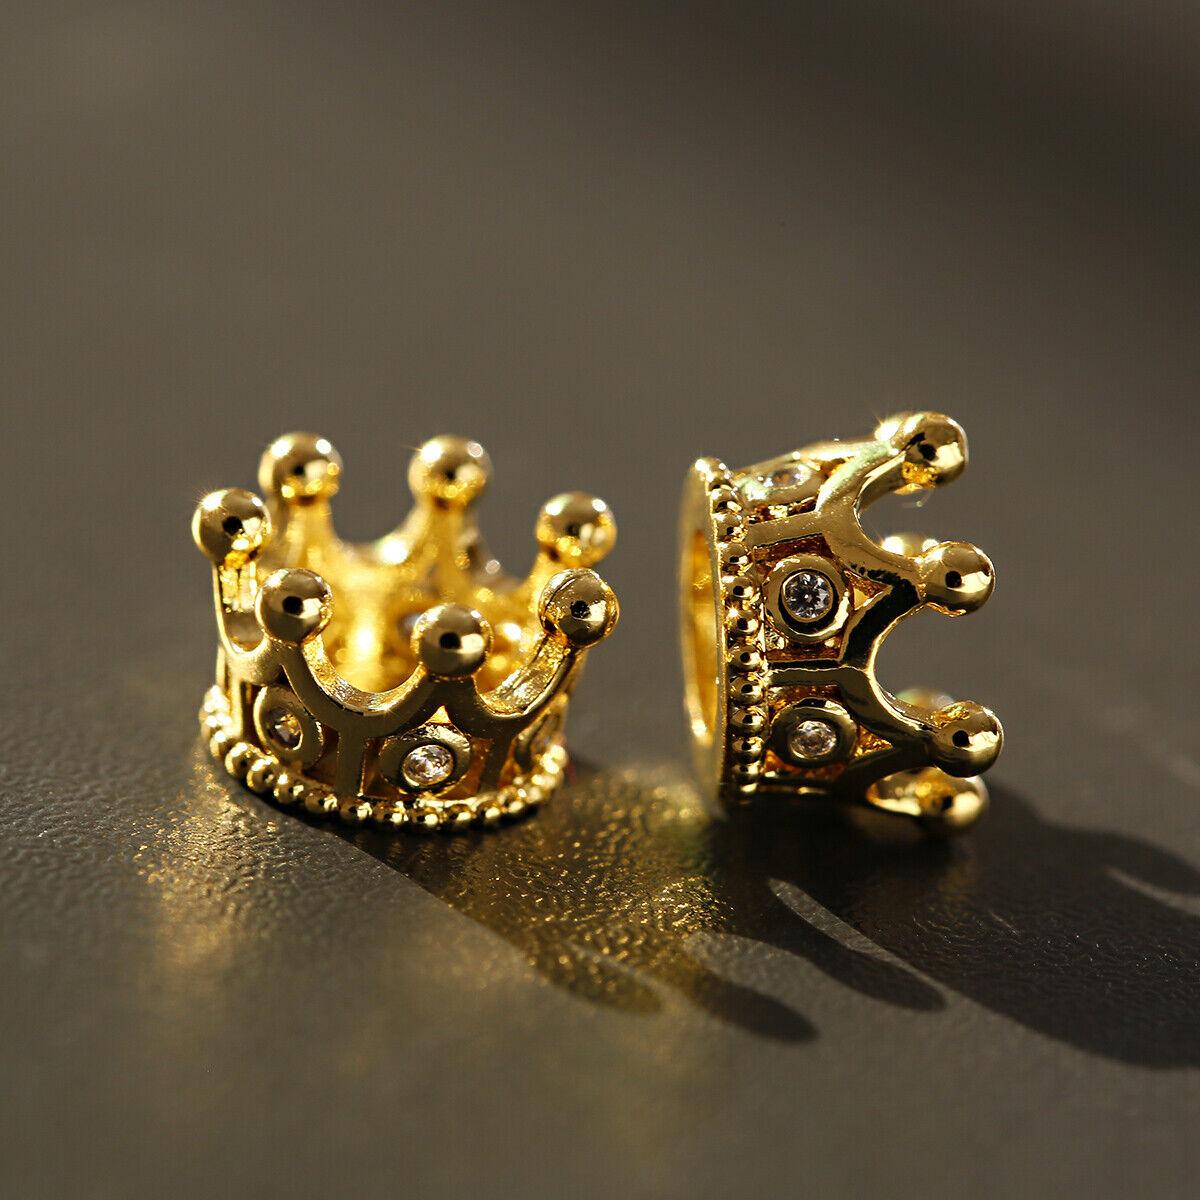 Zircon Gemstones Pave Queen Crown Bracelet Brass Copper Connector Charm Beads 8